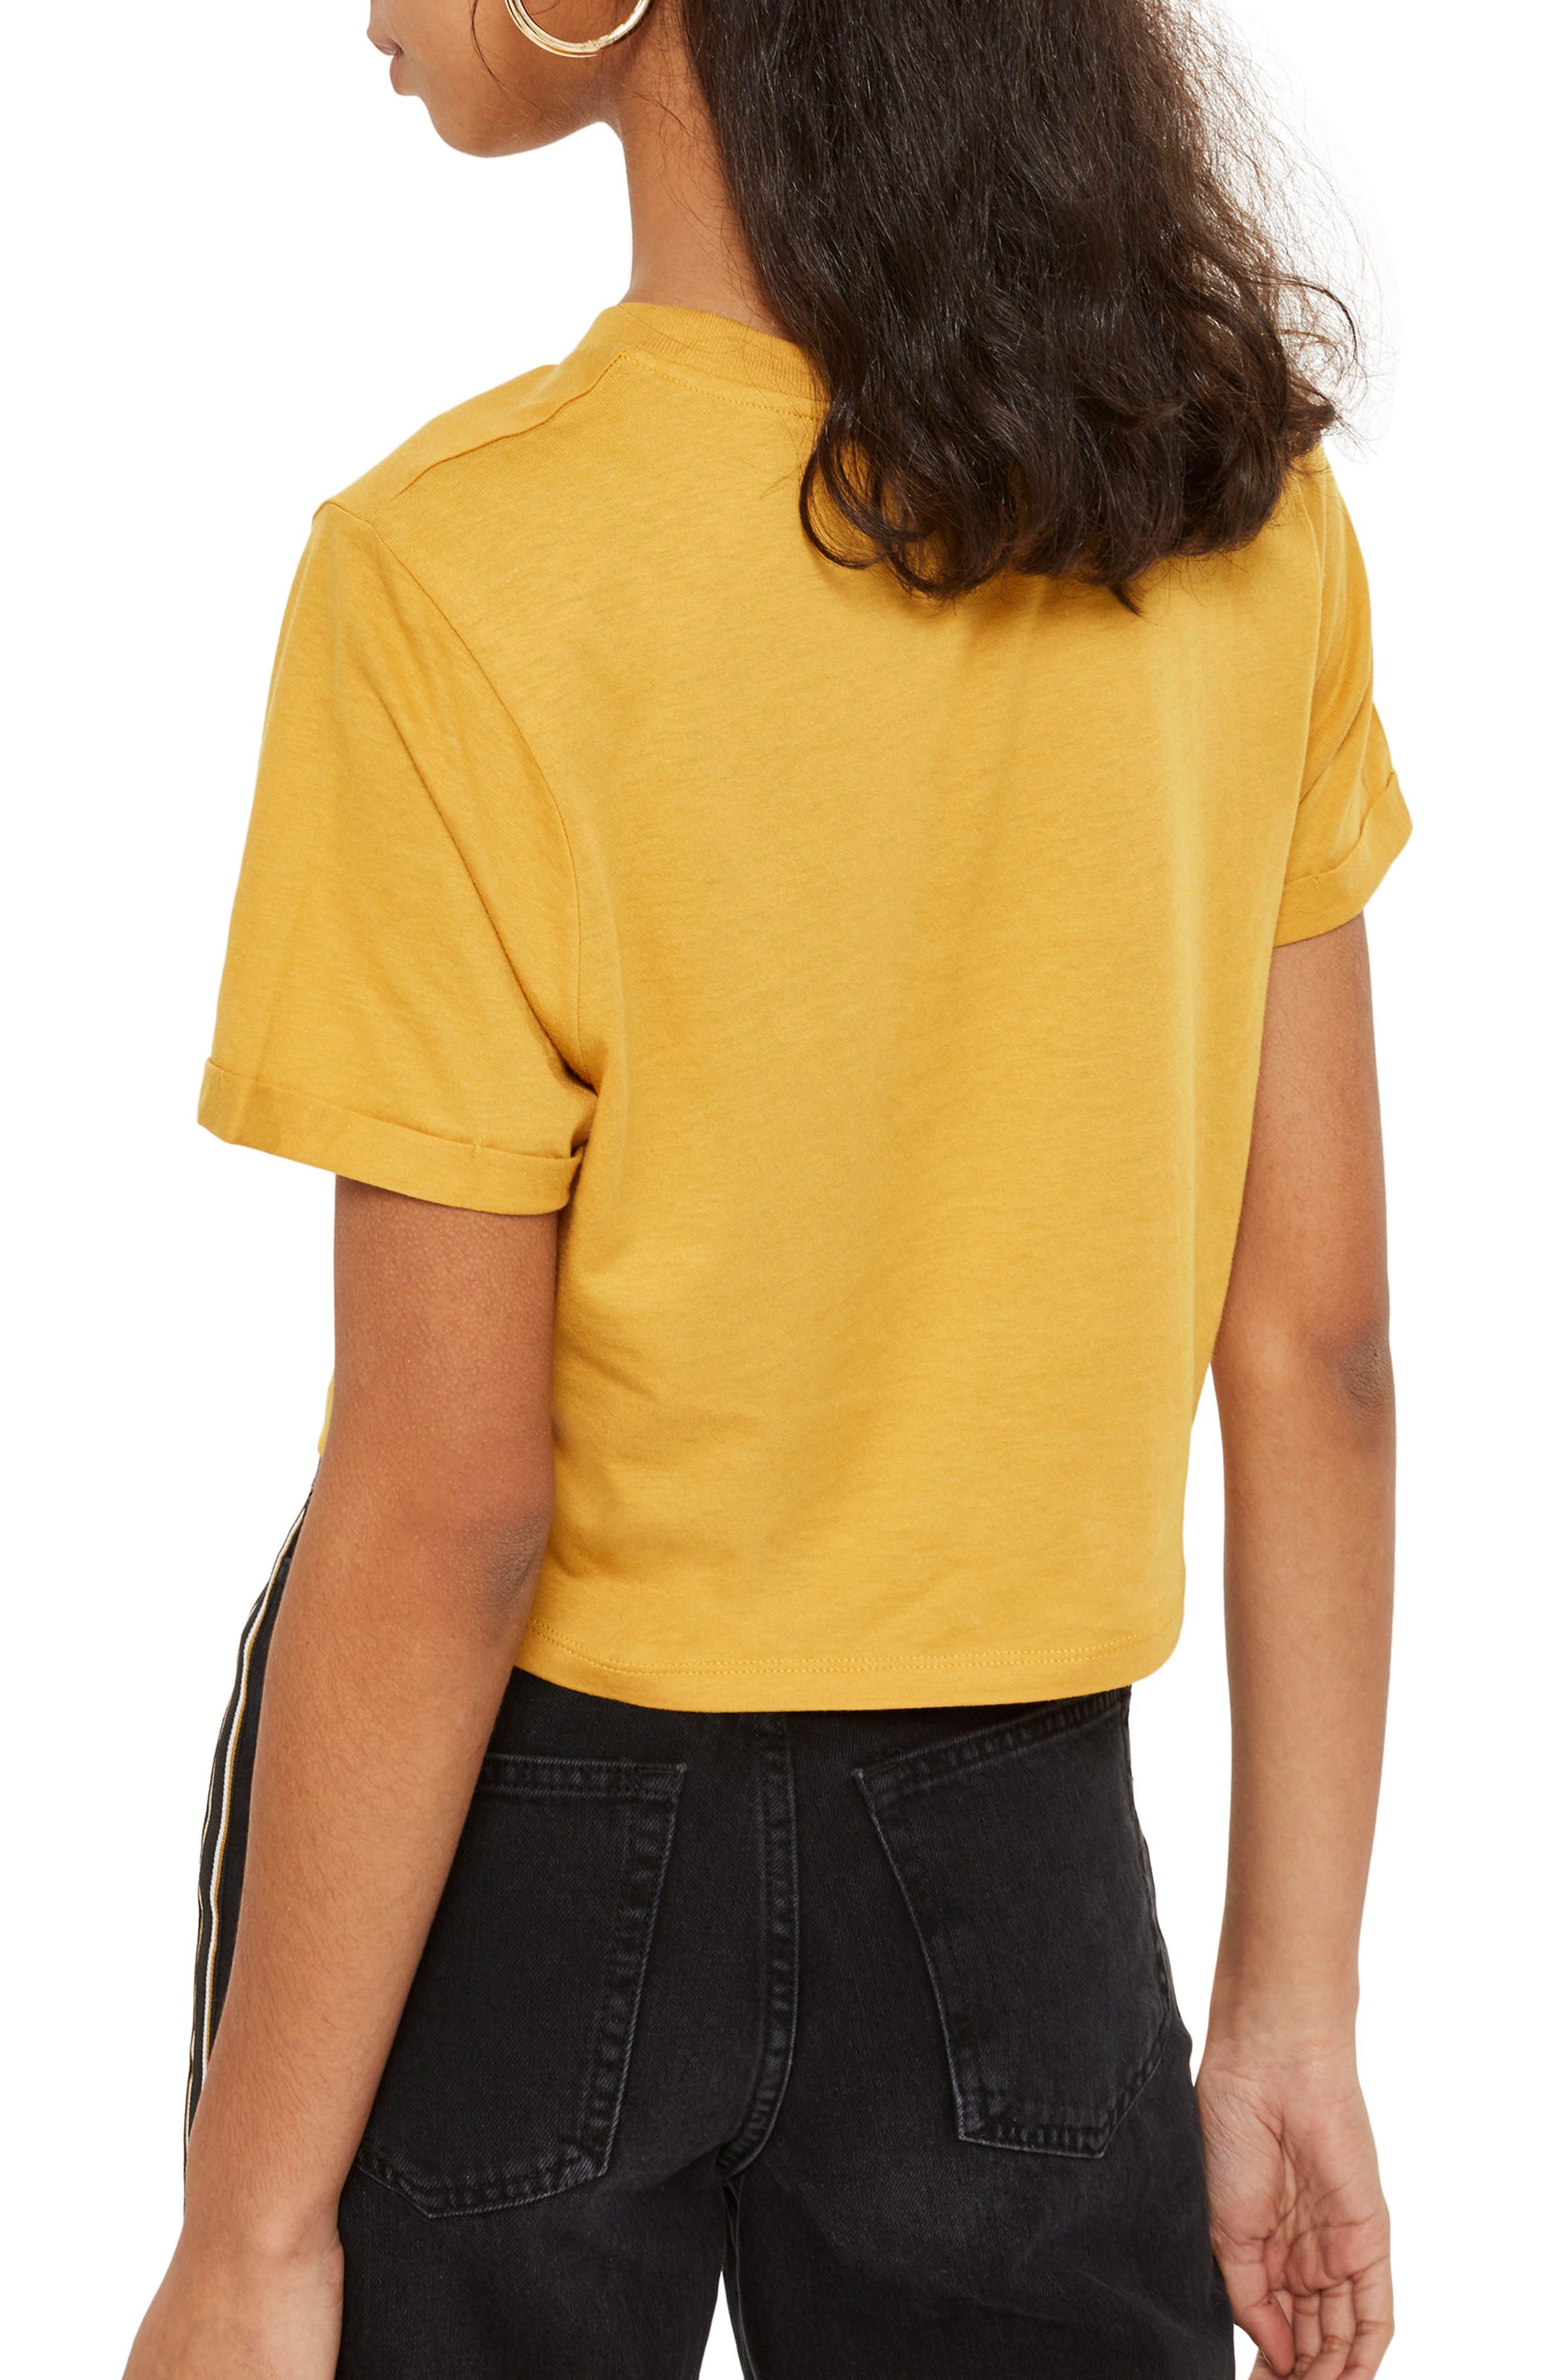 No Hard Feelings Crop T-Shirt,                             Alternate thumbnail 2, color,                             Mustard